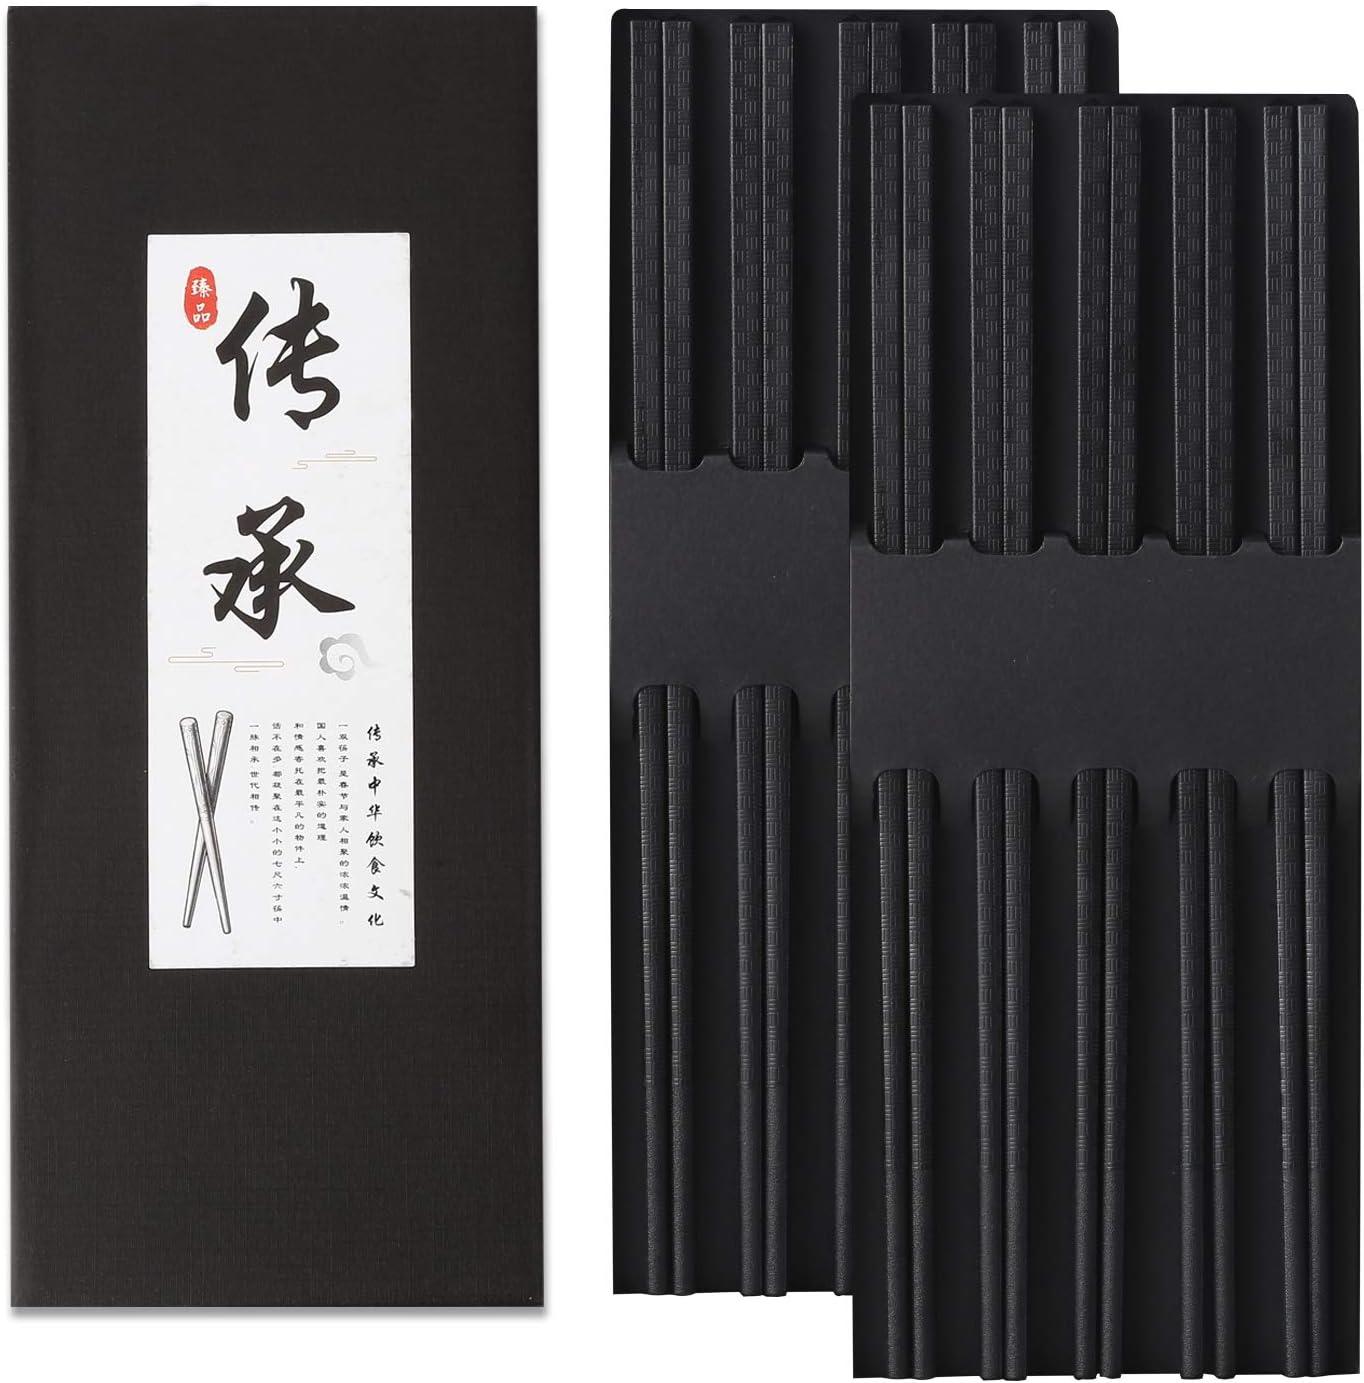 10 Pairs Fiberglass Chopsticks, Reusable Alloy Chop Sticks Non-slip Chopsticks in Minimalism Style, Dishwasher, 9 1/2 Inches (black bambootexture)